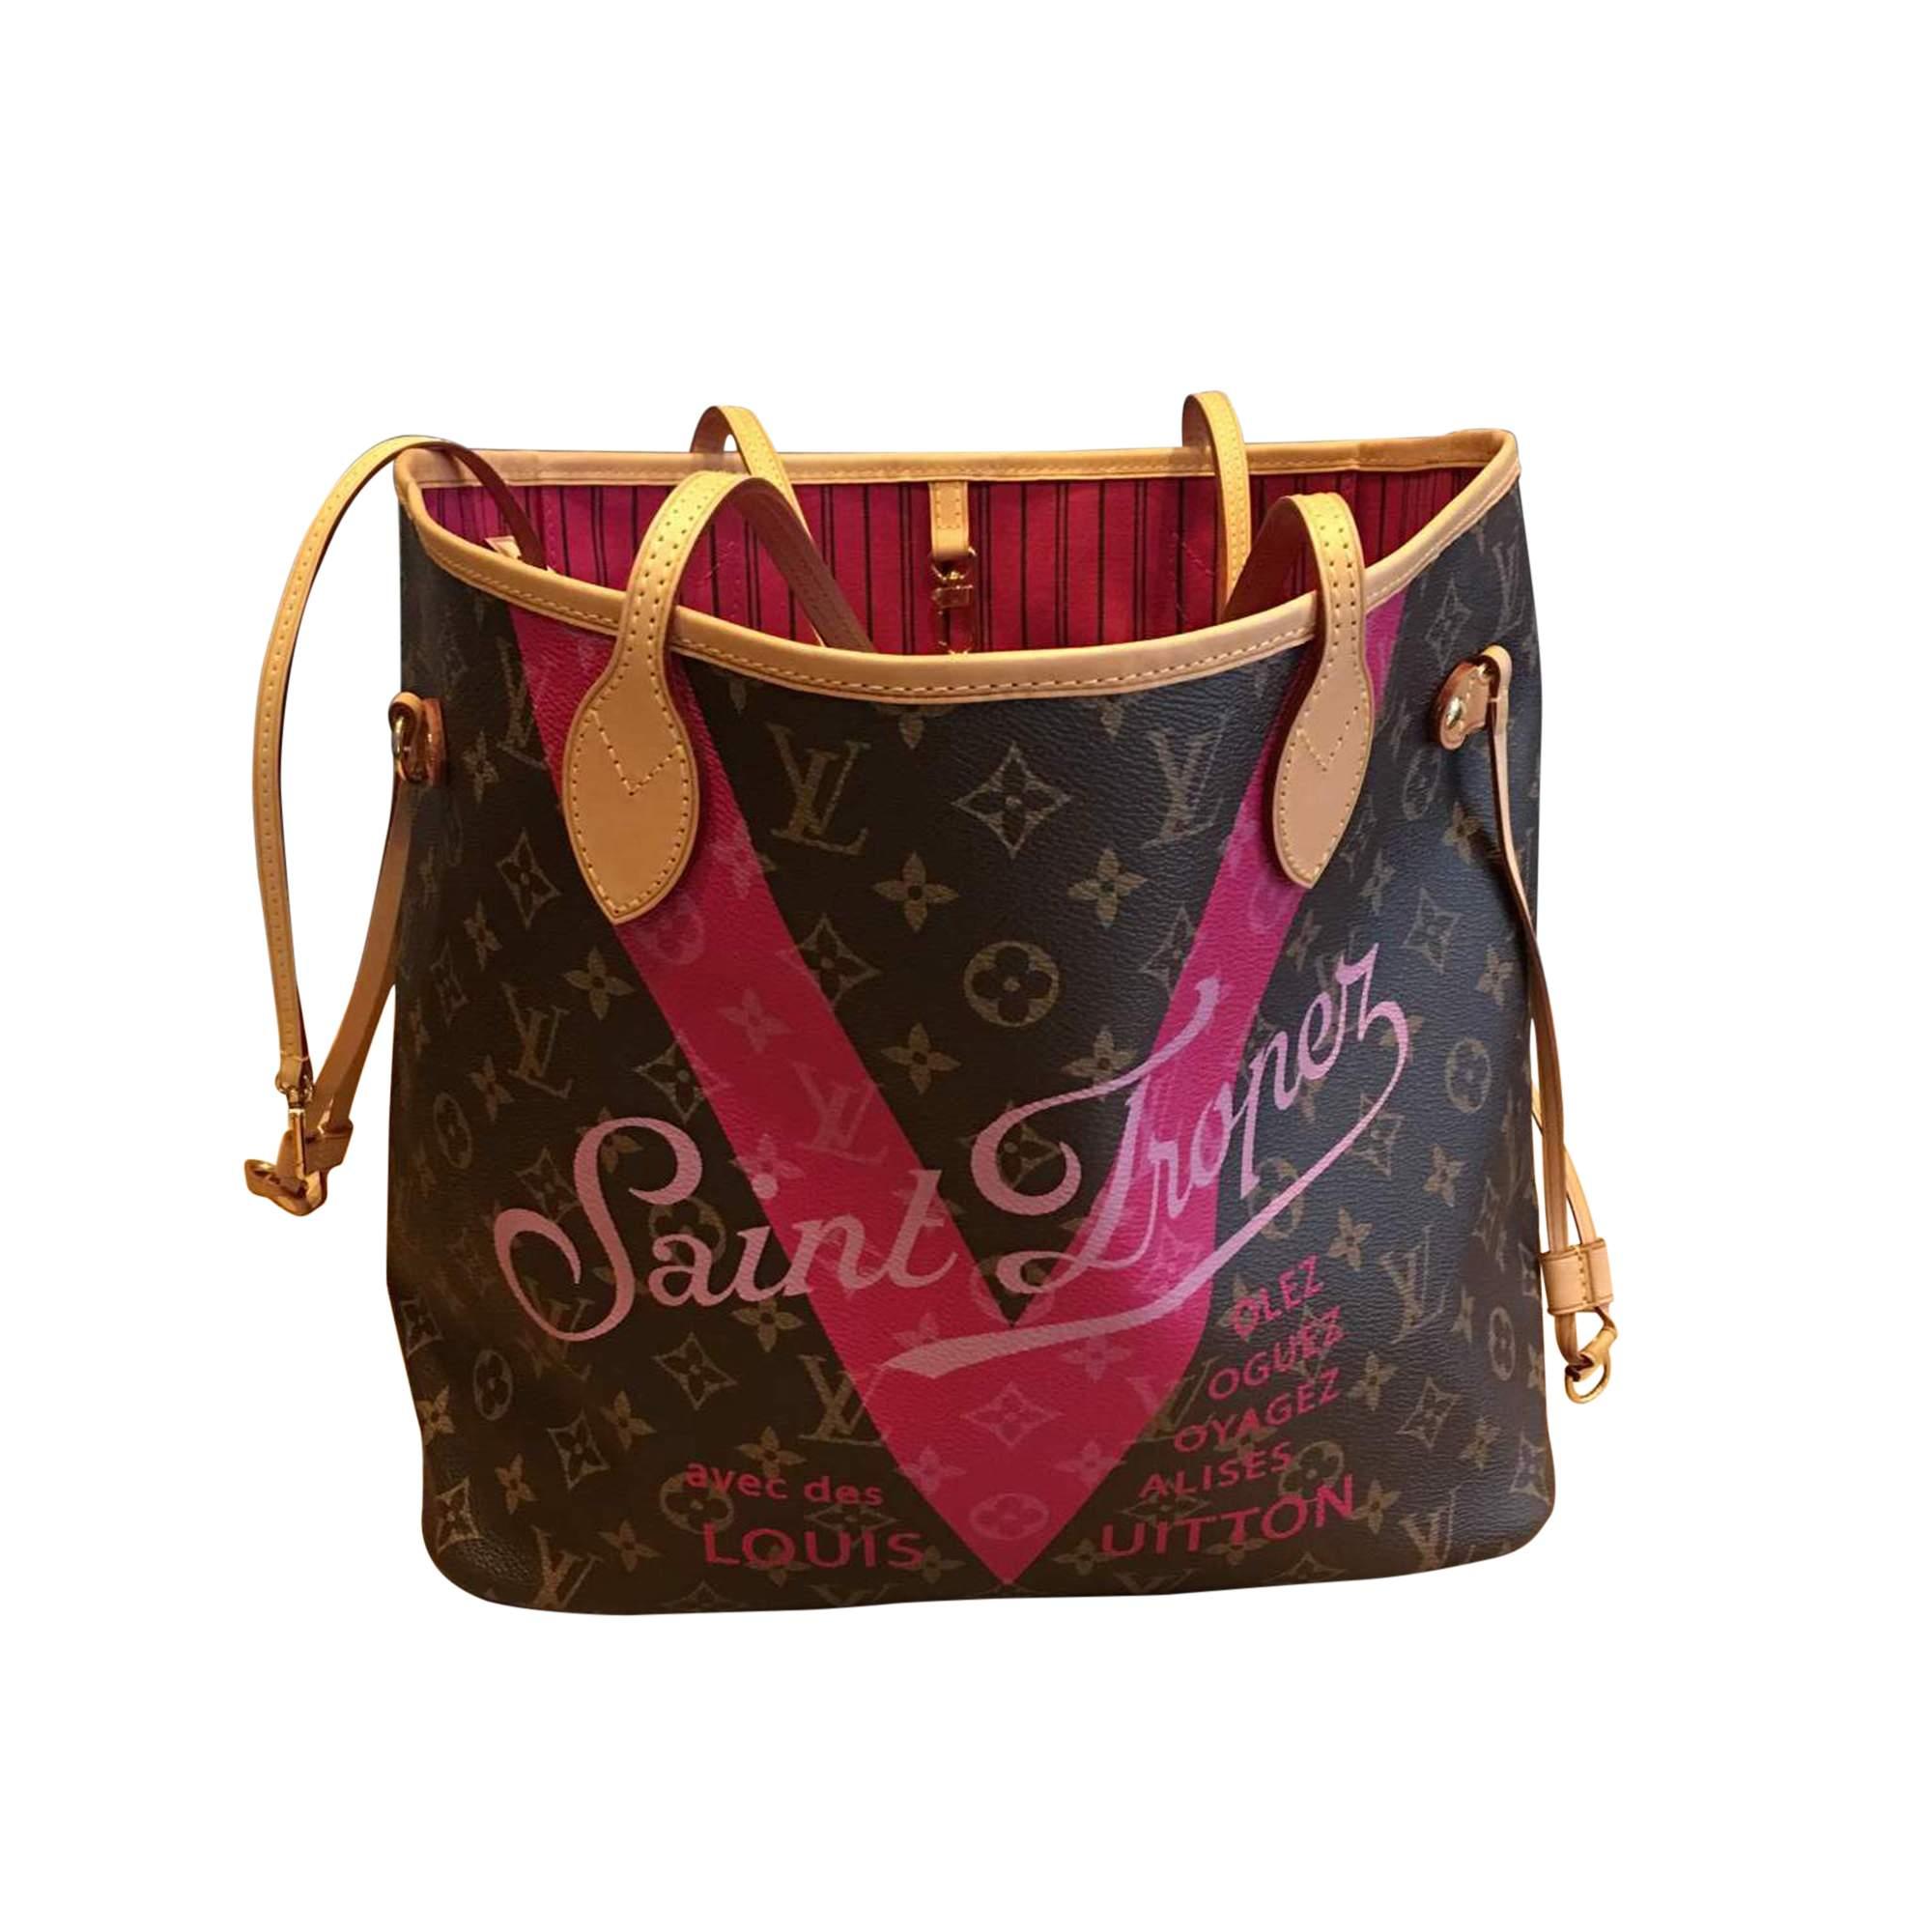 Louis Vuitton Neverfull Saint-Tropez   The Chic Selection a4295ff545a